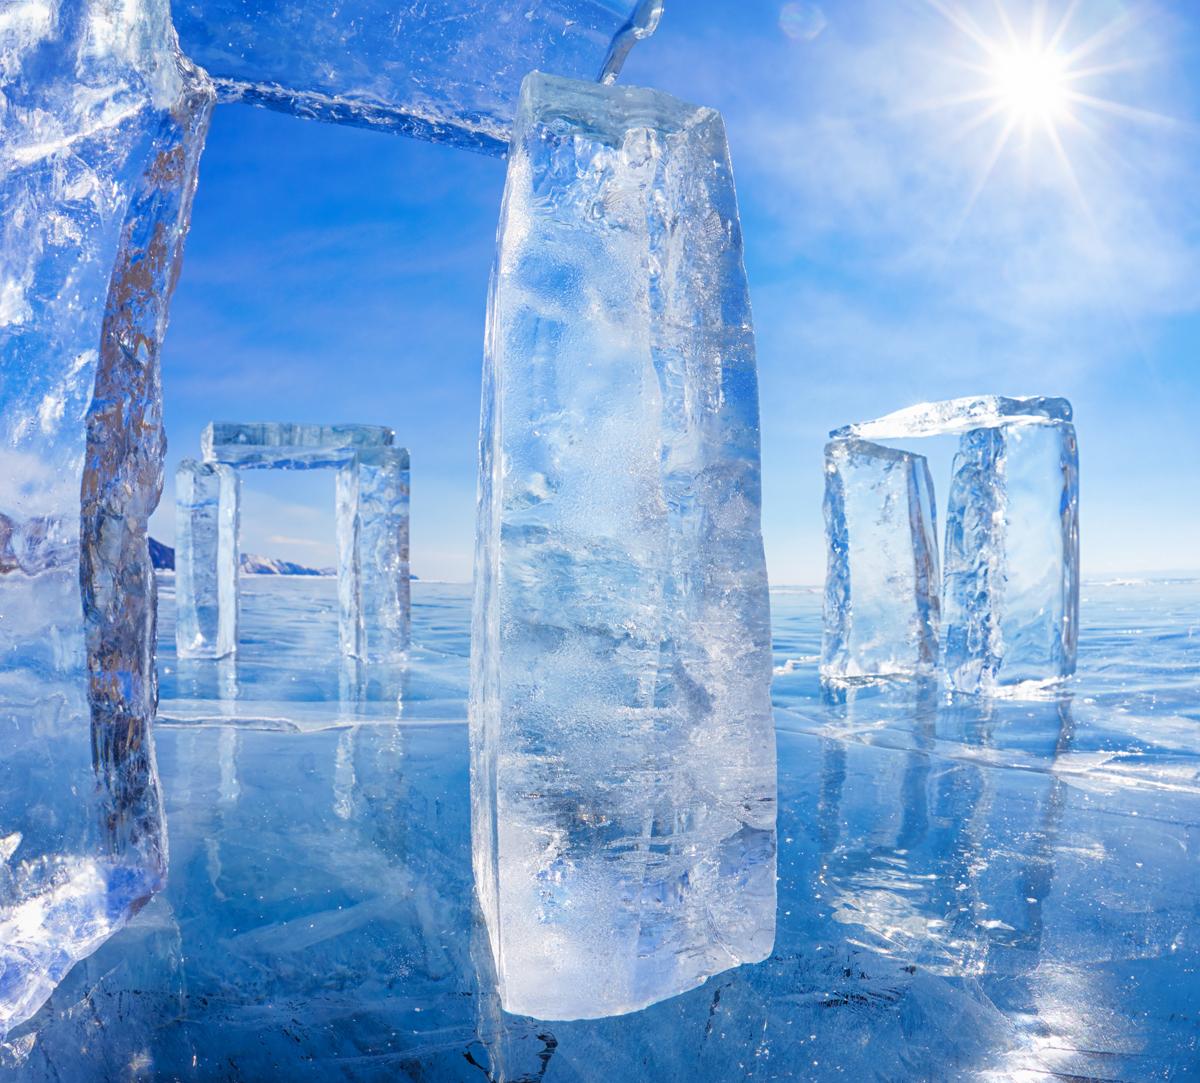 Agências locais preparam terreno gelado para receber turistas Foto: Lori/Legion-Media